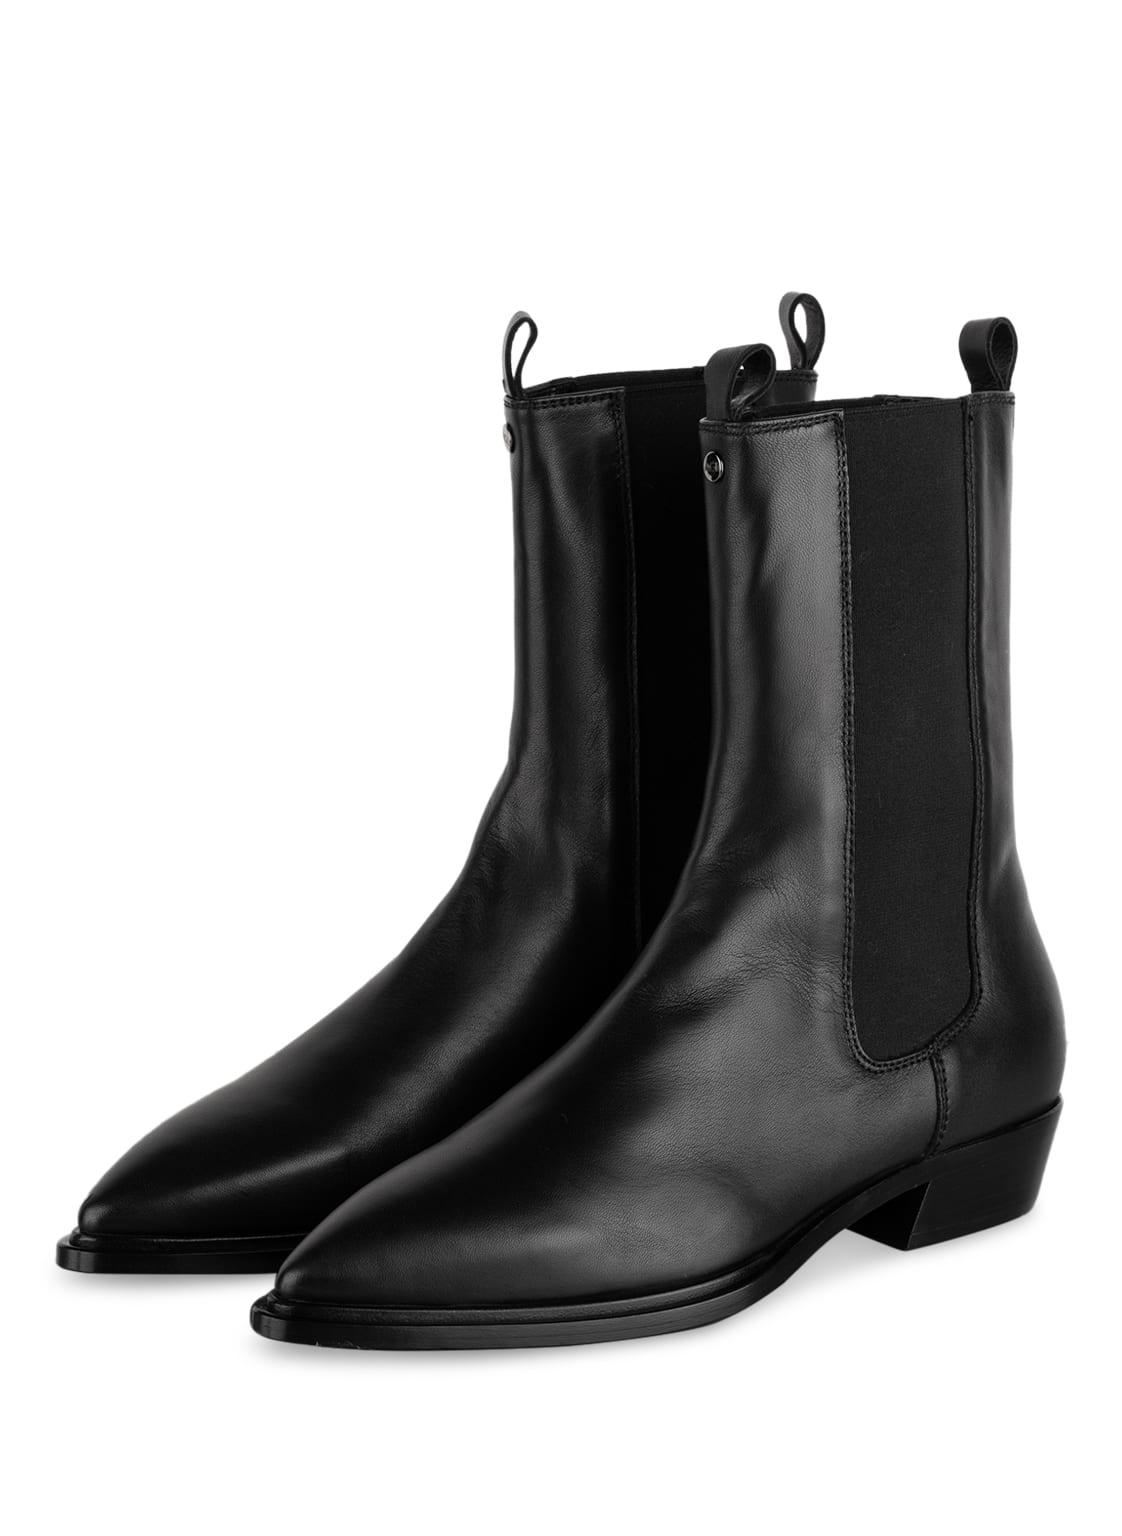 Image of Agl Chelsea-Boots Mahe schwarz